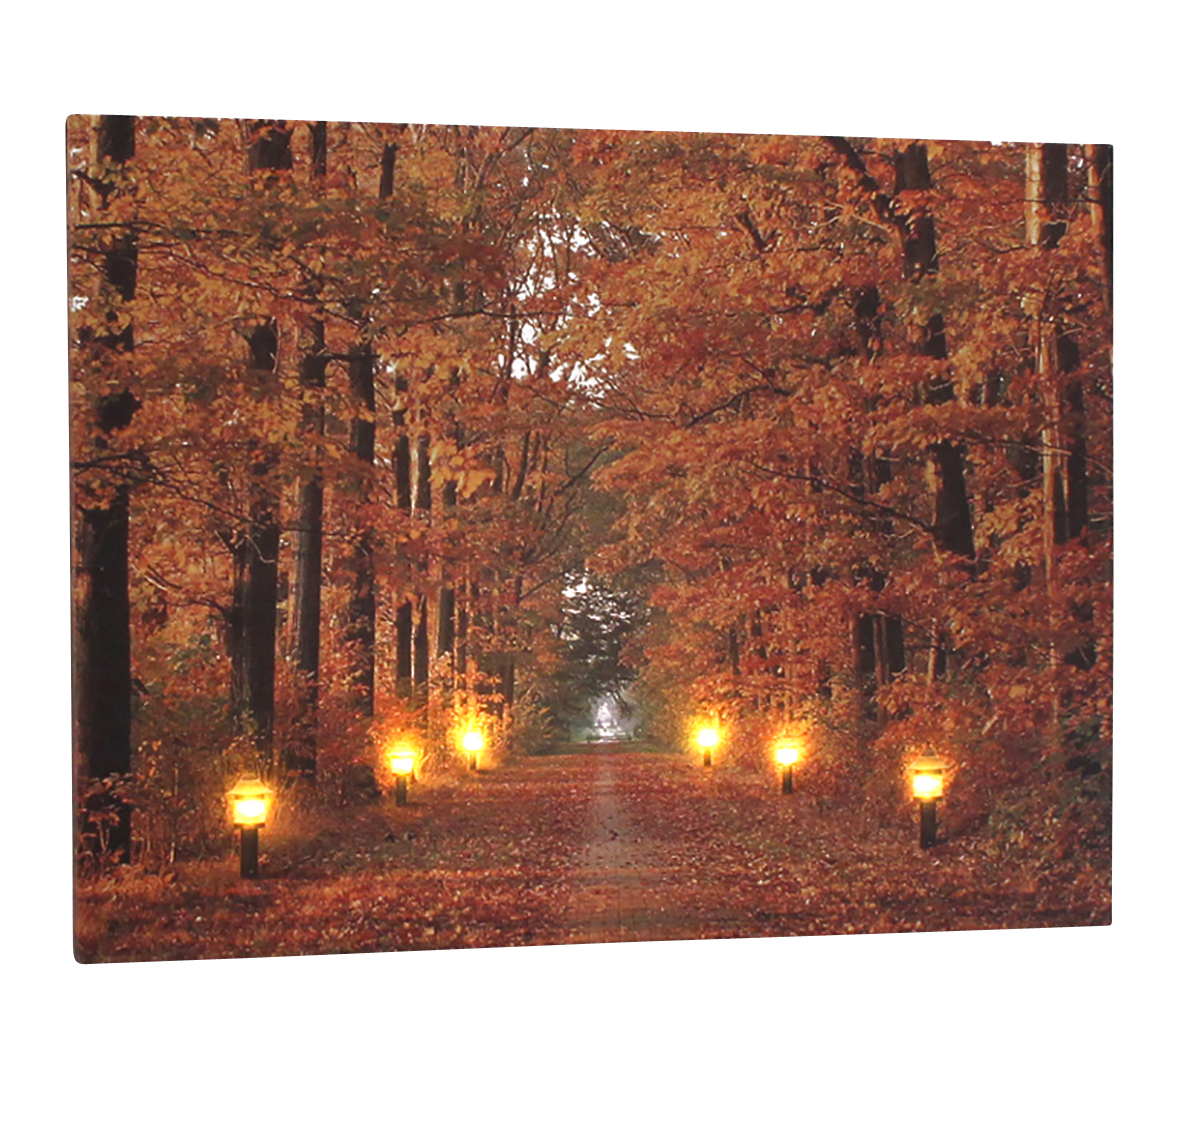 leinwandbild mit led beleuchtung wandbild herbst mit 6 laternen leuchtbild led bild m bel. Black Bedroom Furniture Sets. Home Design Ideas